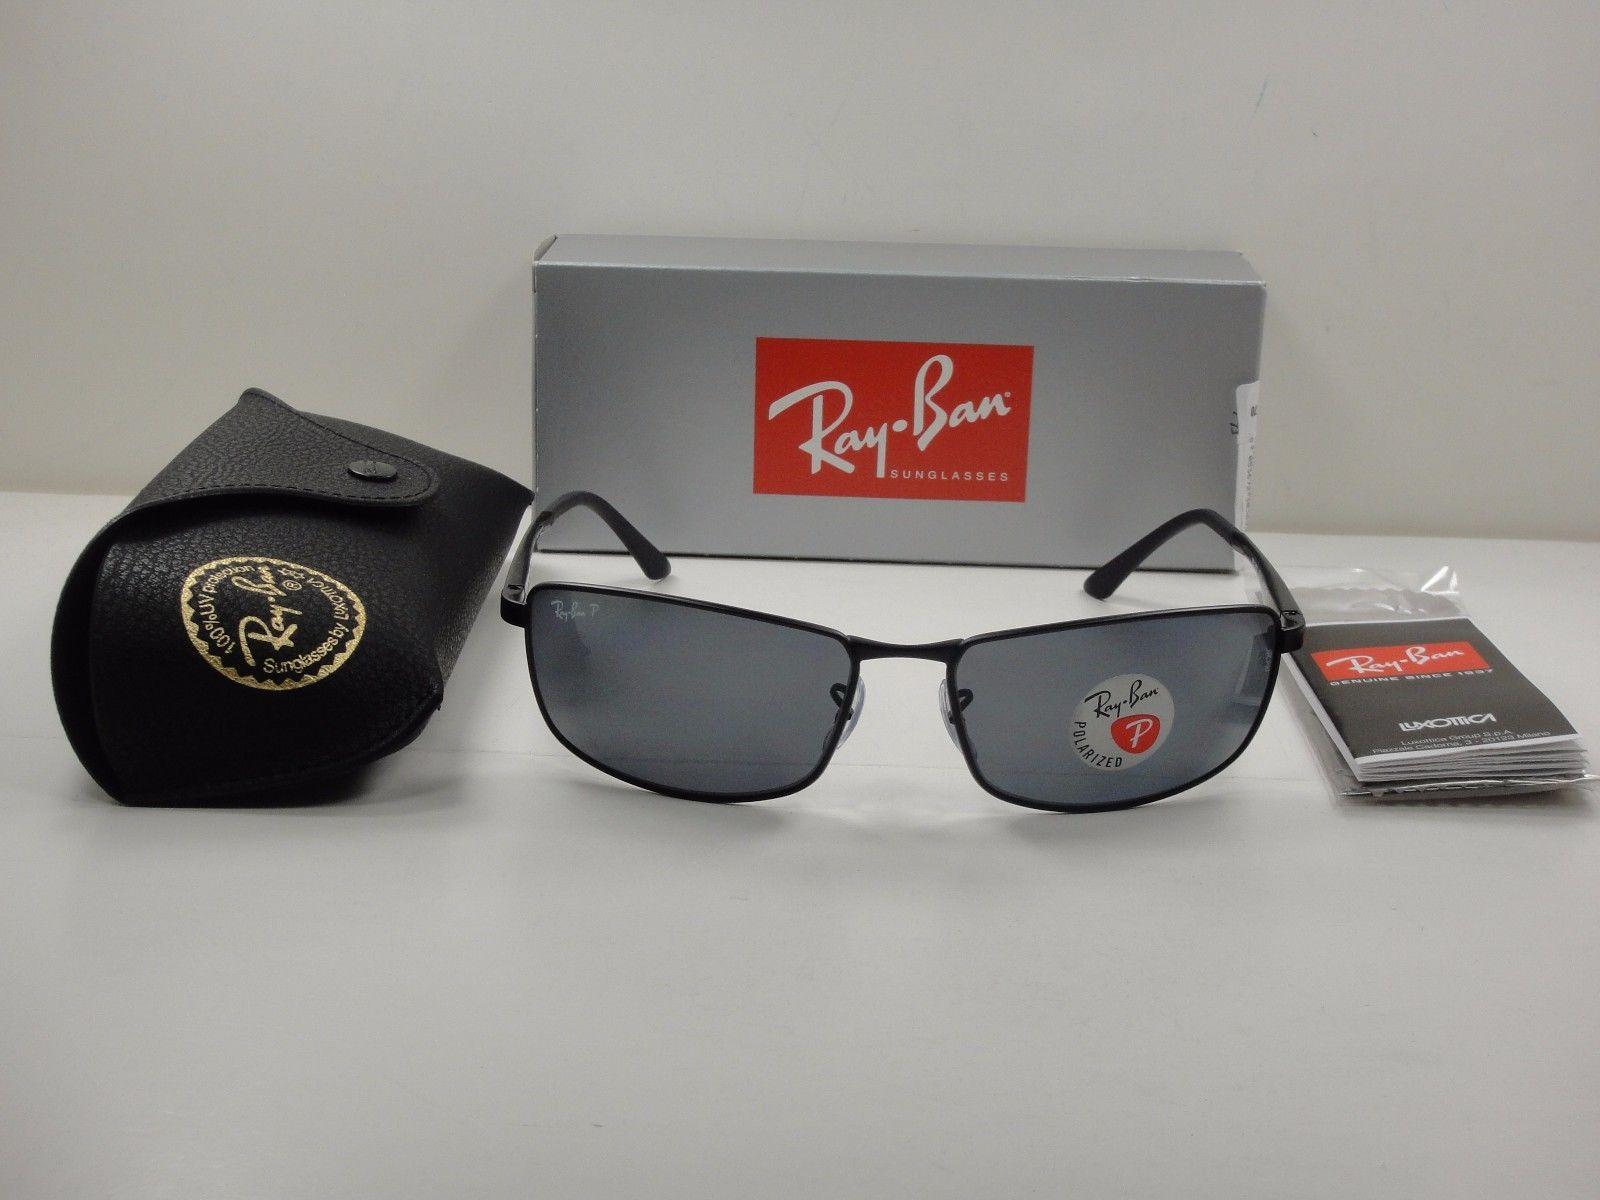 Ray Ban RB3498 006/81 Black frame Gray lens Polarized